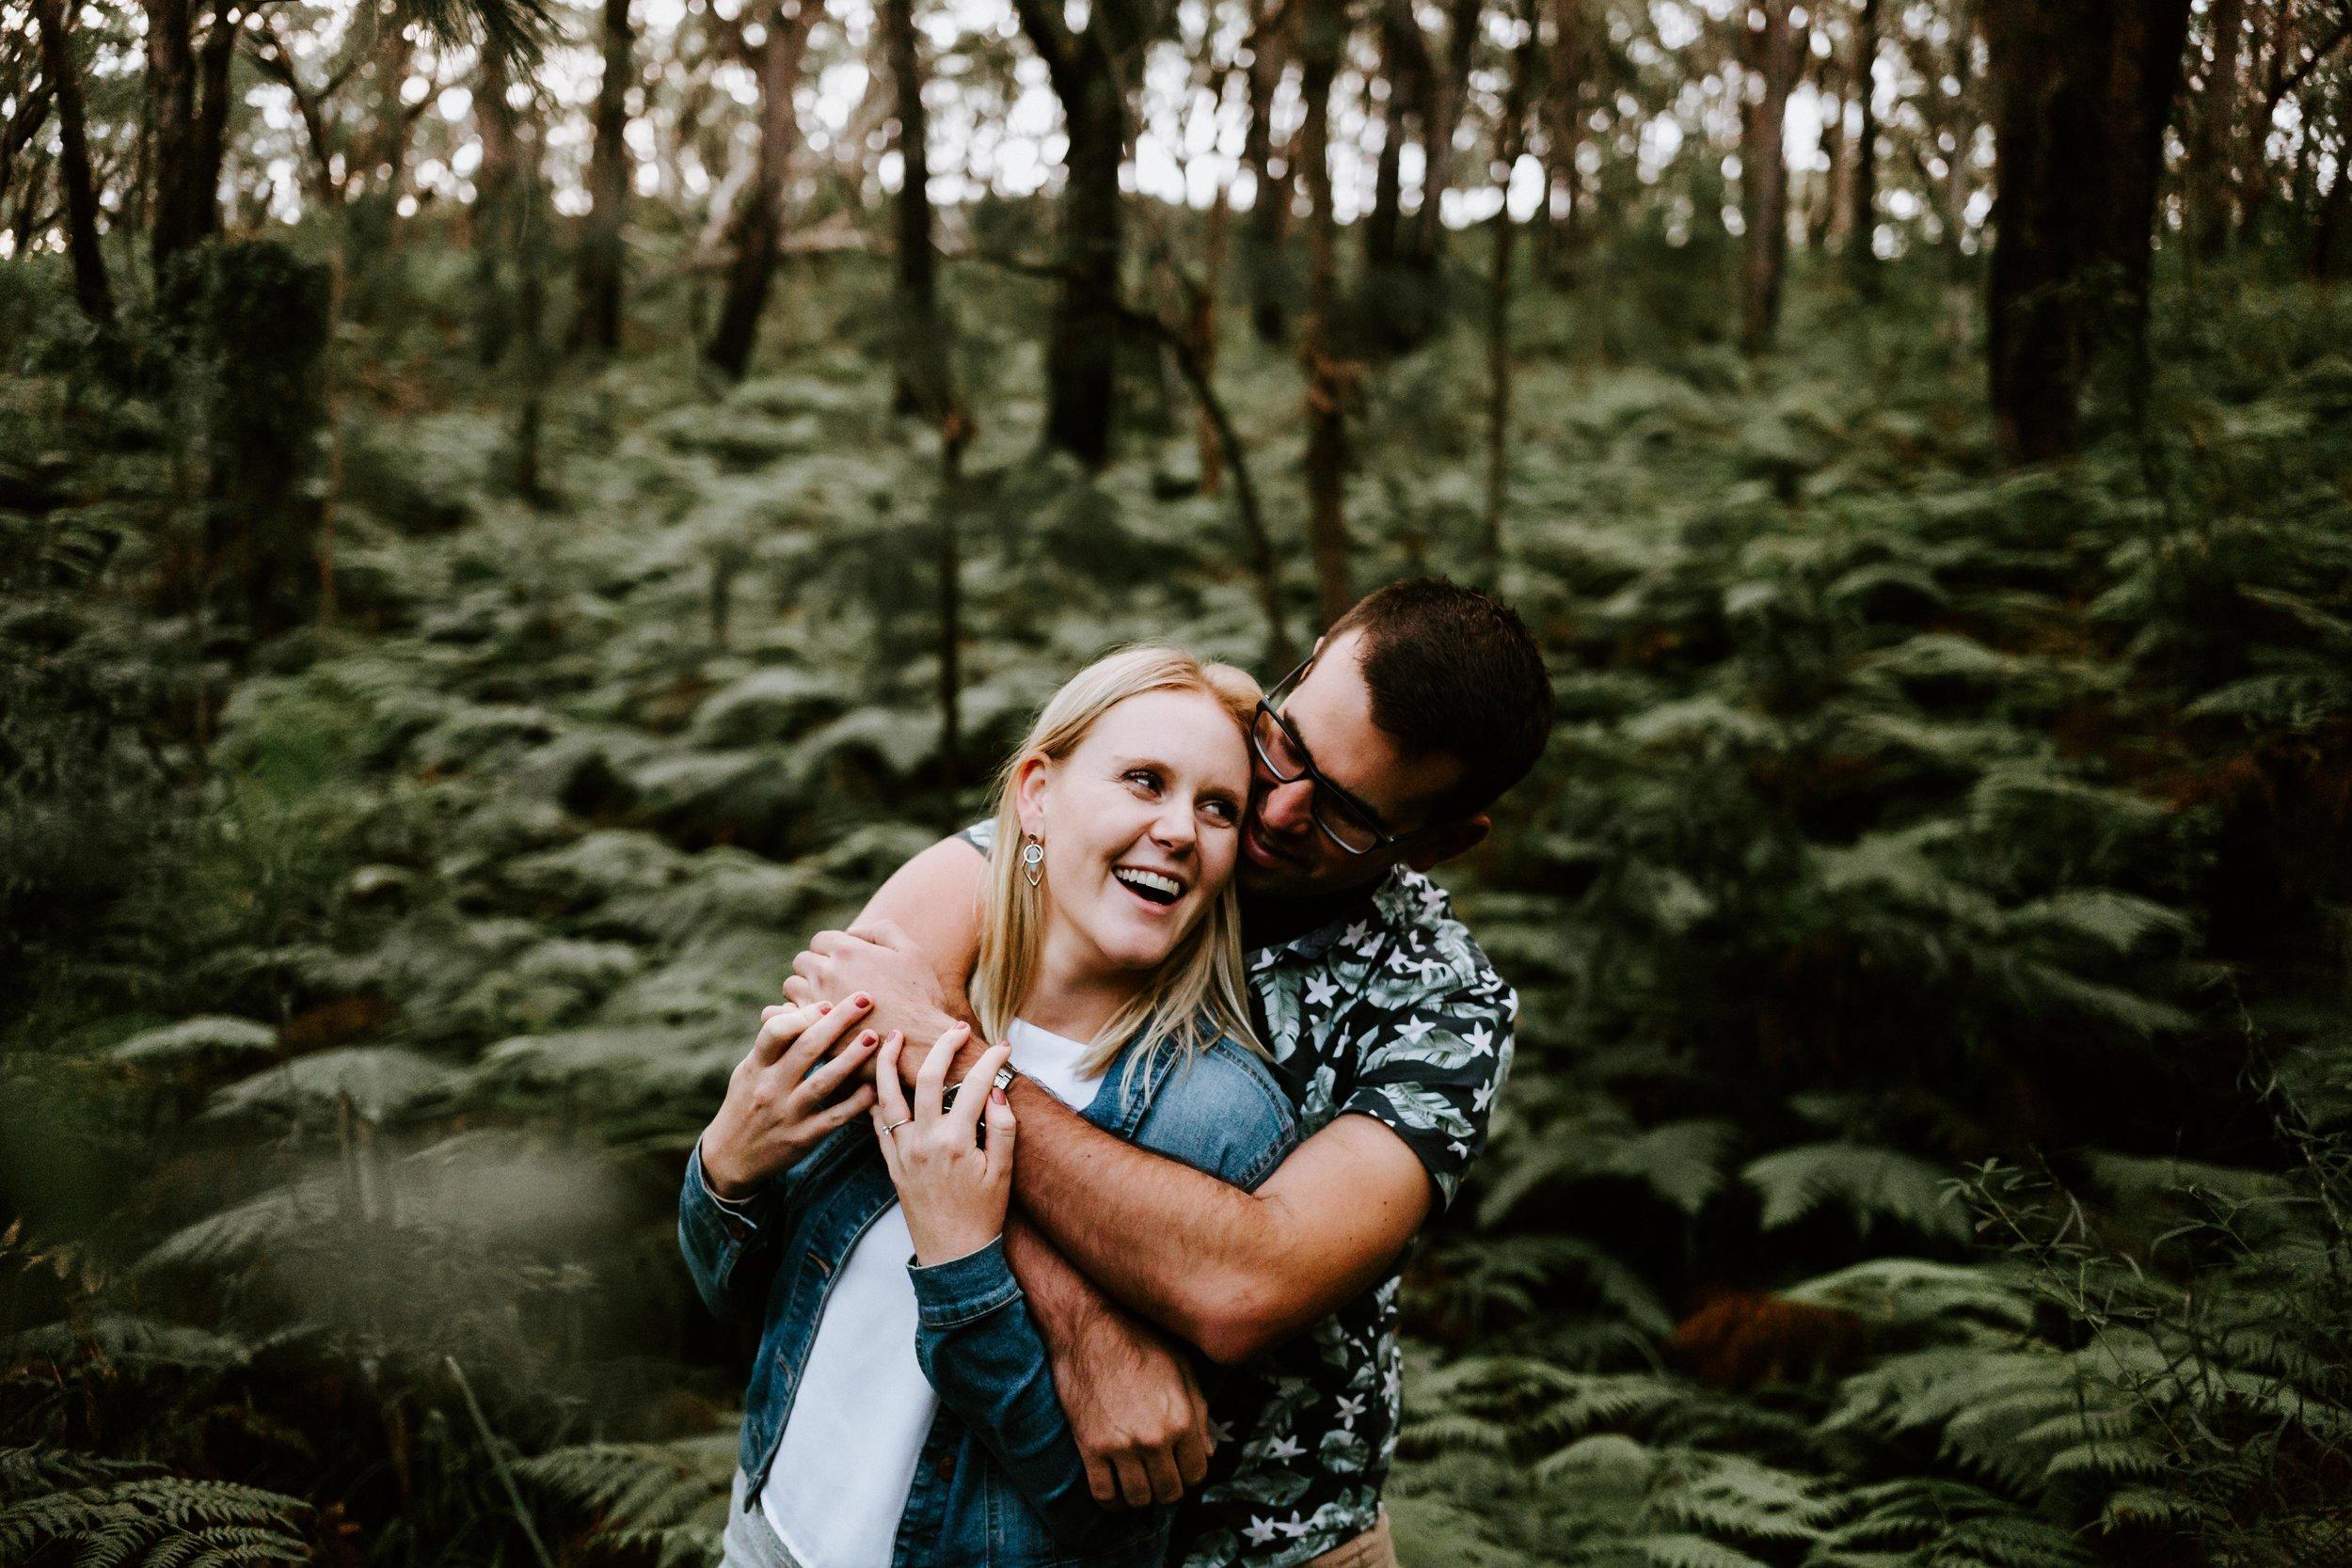 Belinda + Andrea ESHOOT - Final Edits-35.jpg